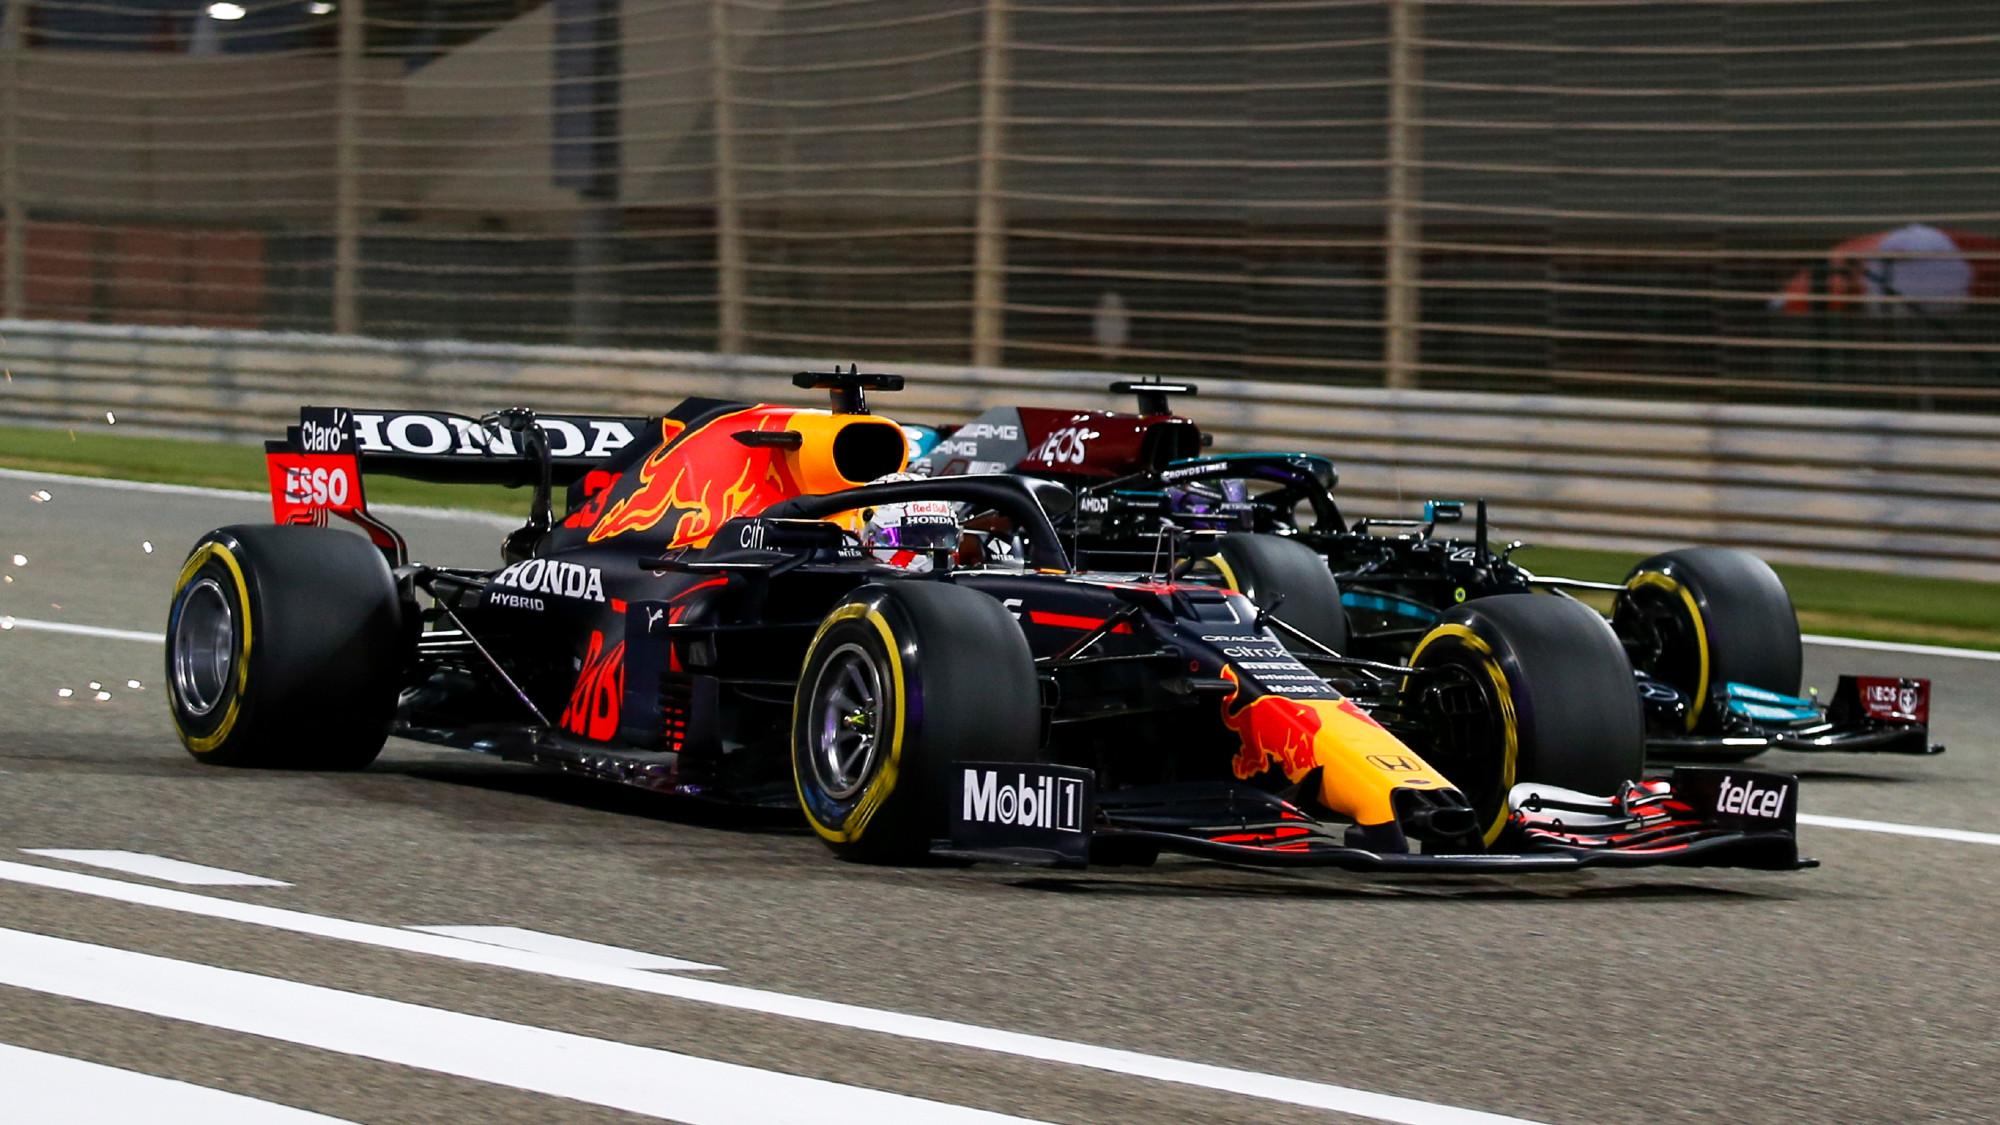 Max Verstappen, Lewis Hamilton, 2021 Bahrain GP